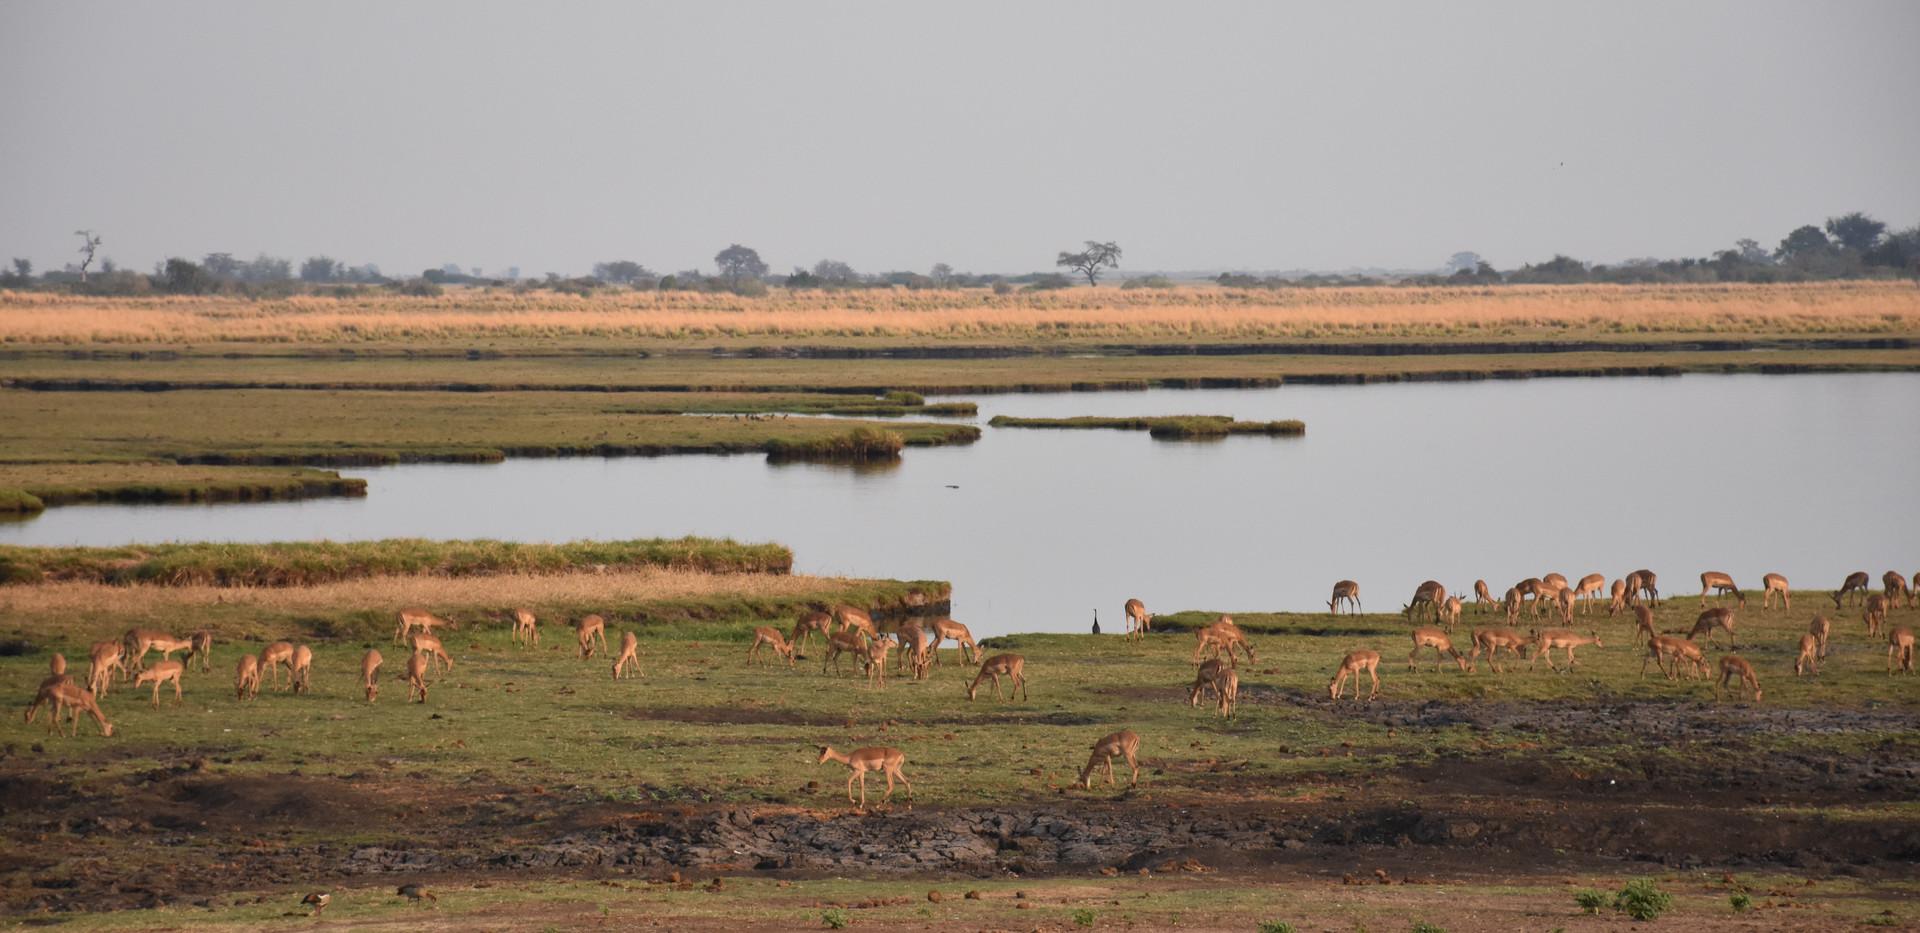 Chobe River view